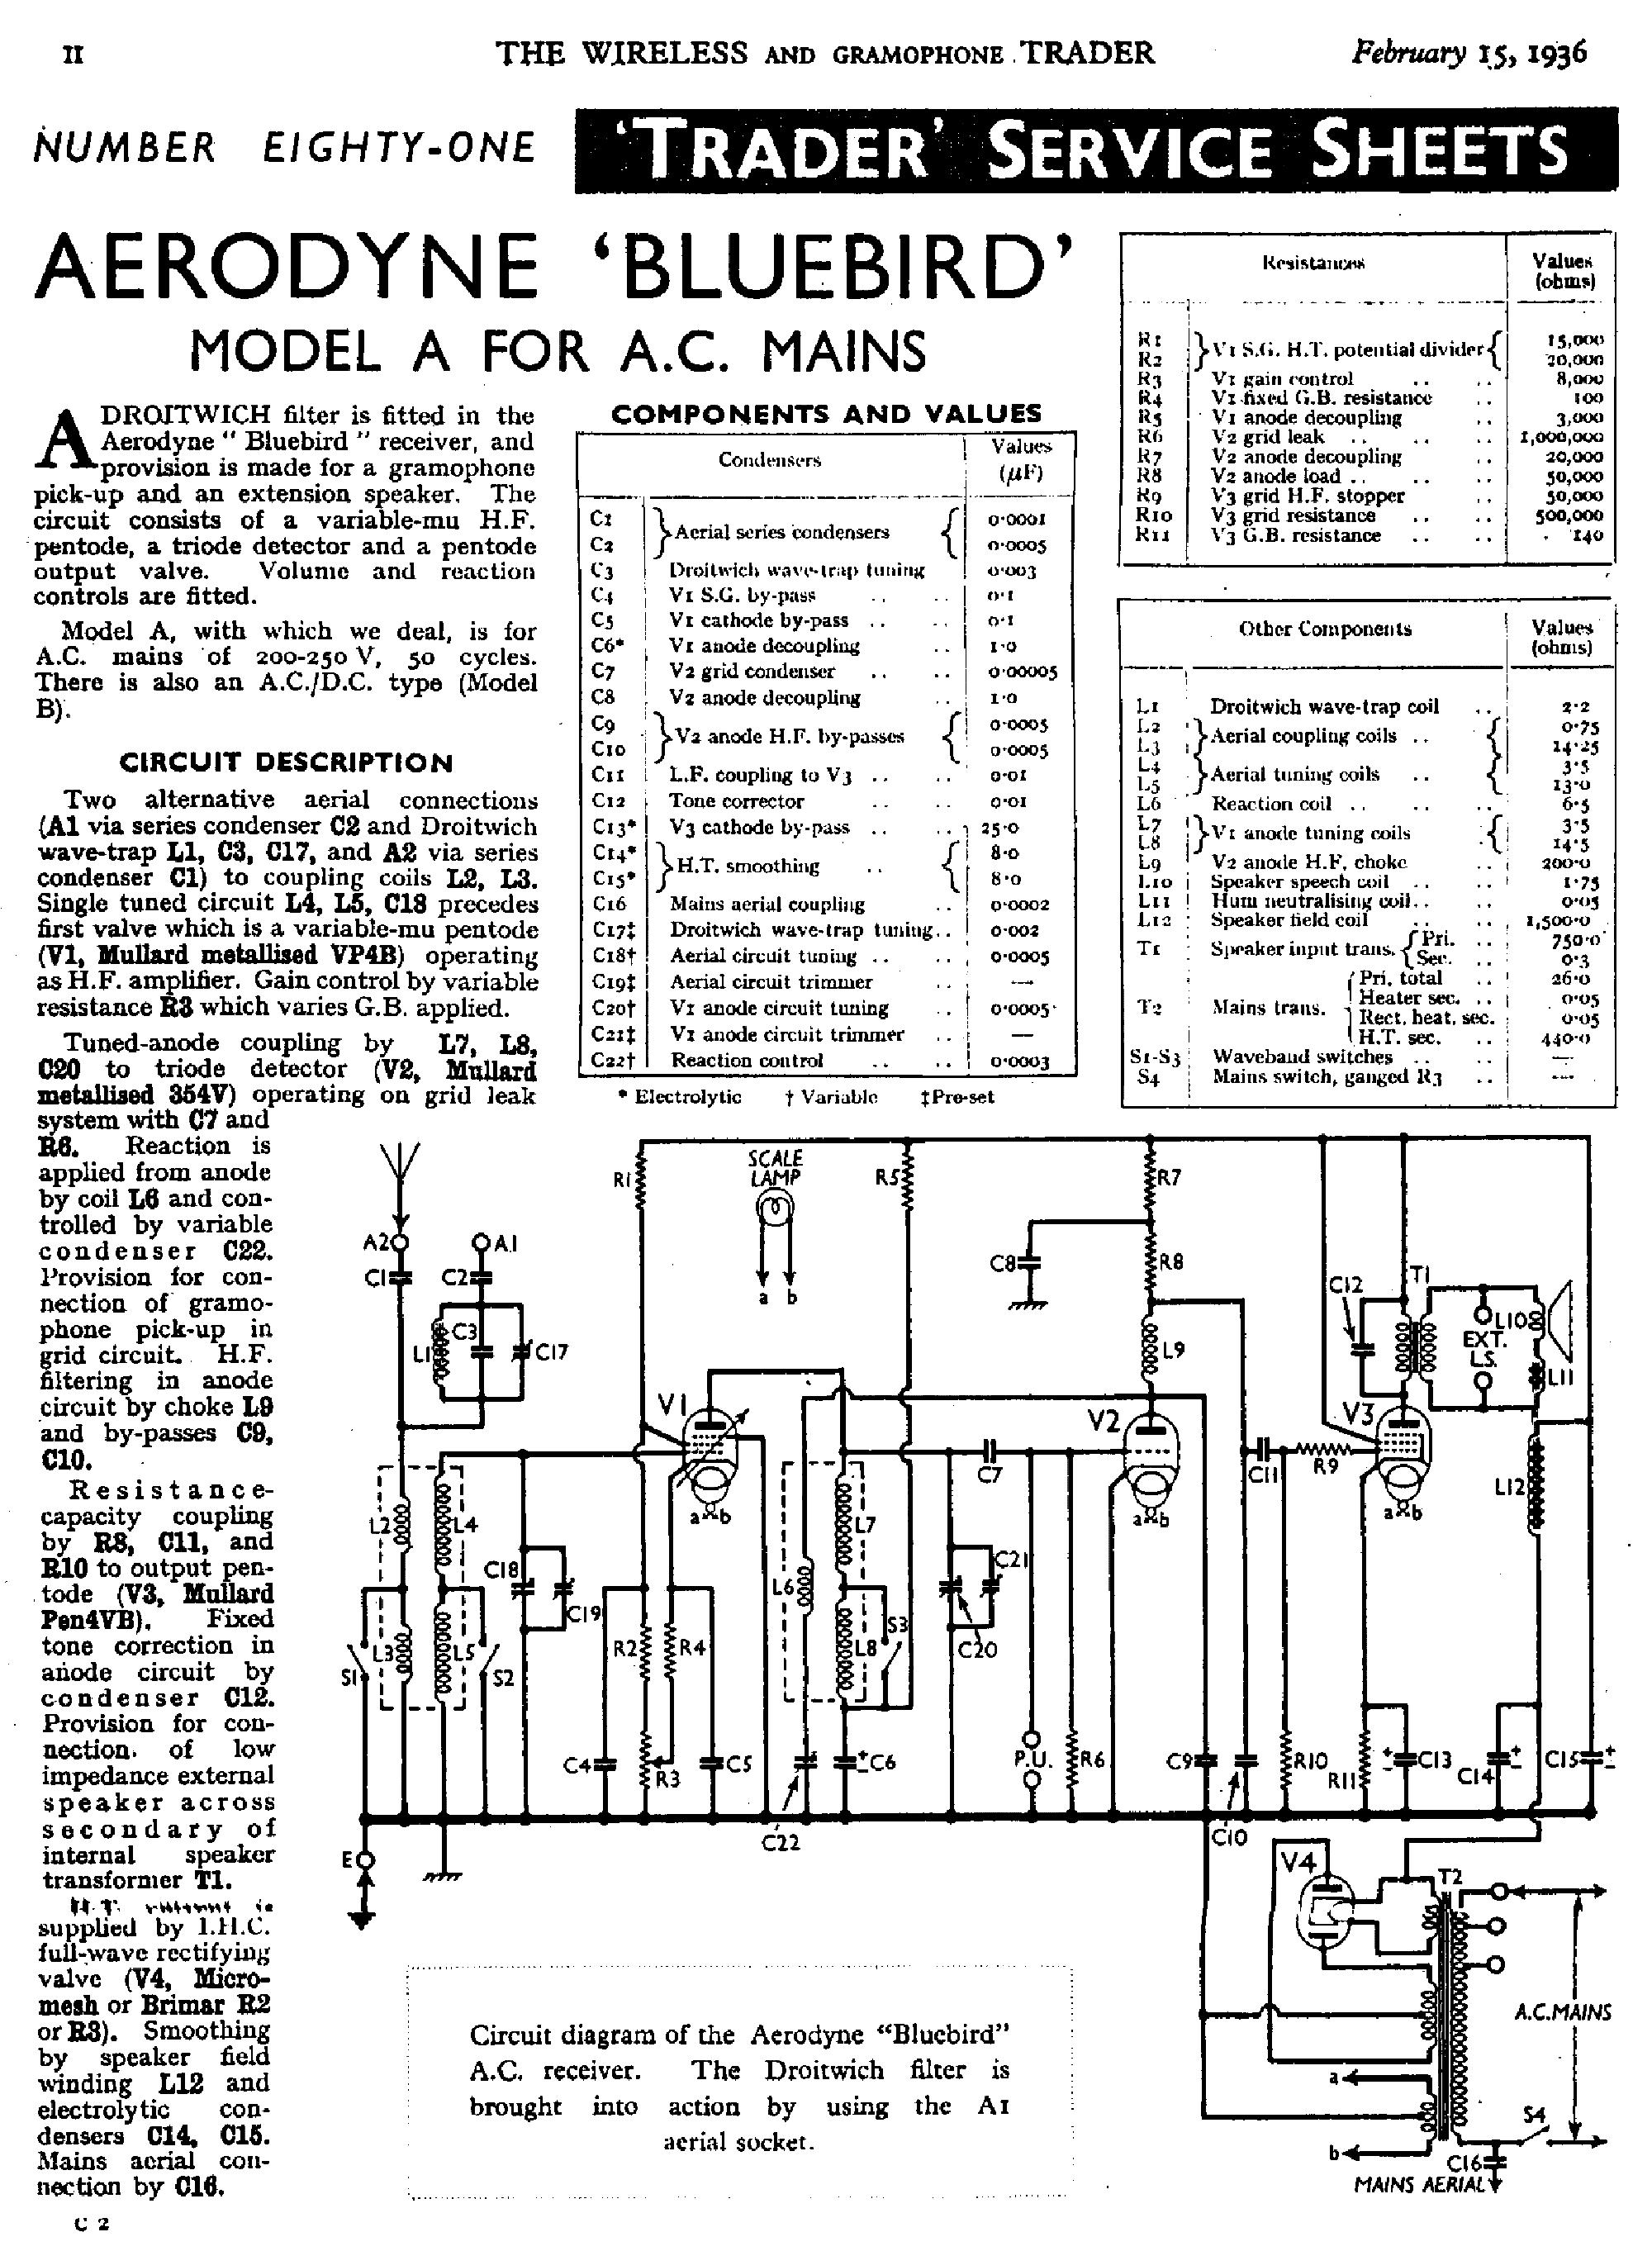 AERODYNE BLUEBIRD RADIO 1936 SM Service Manual download, schematics ...